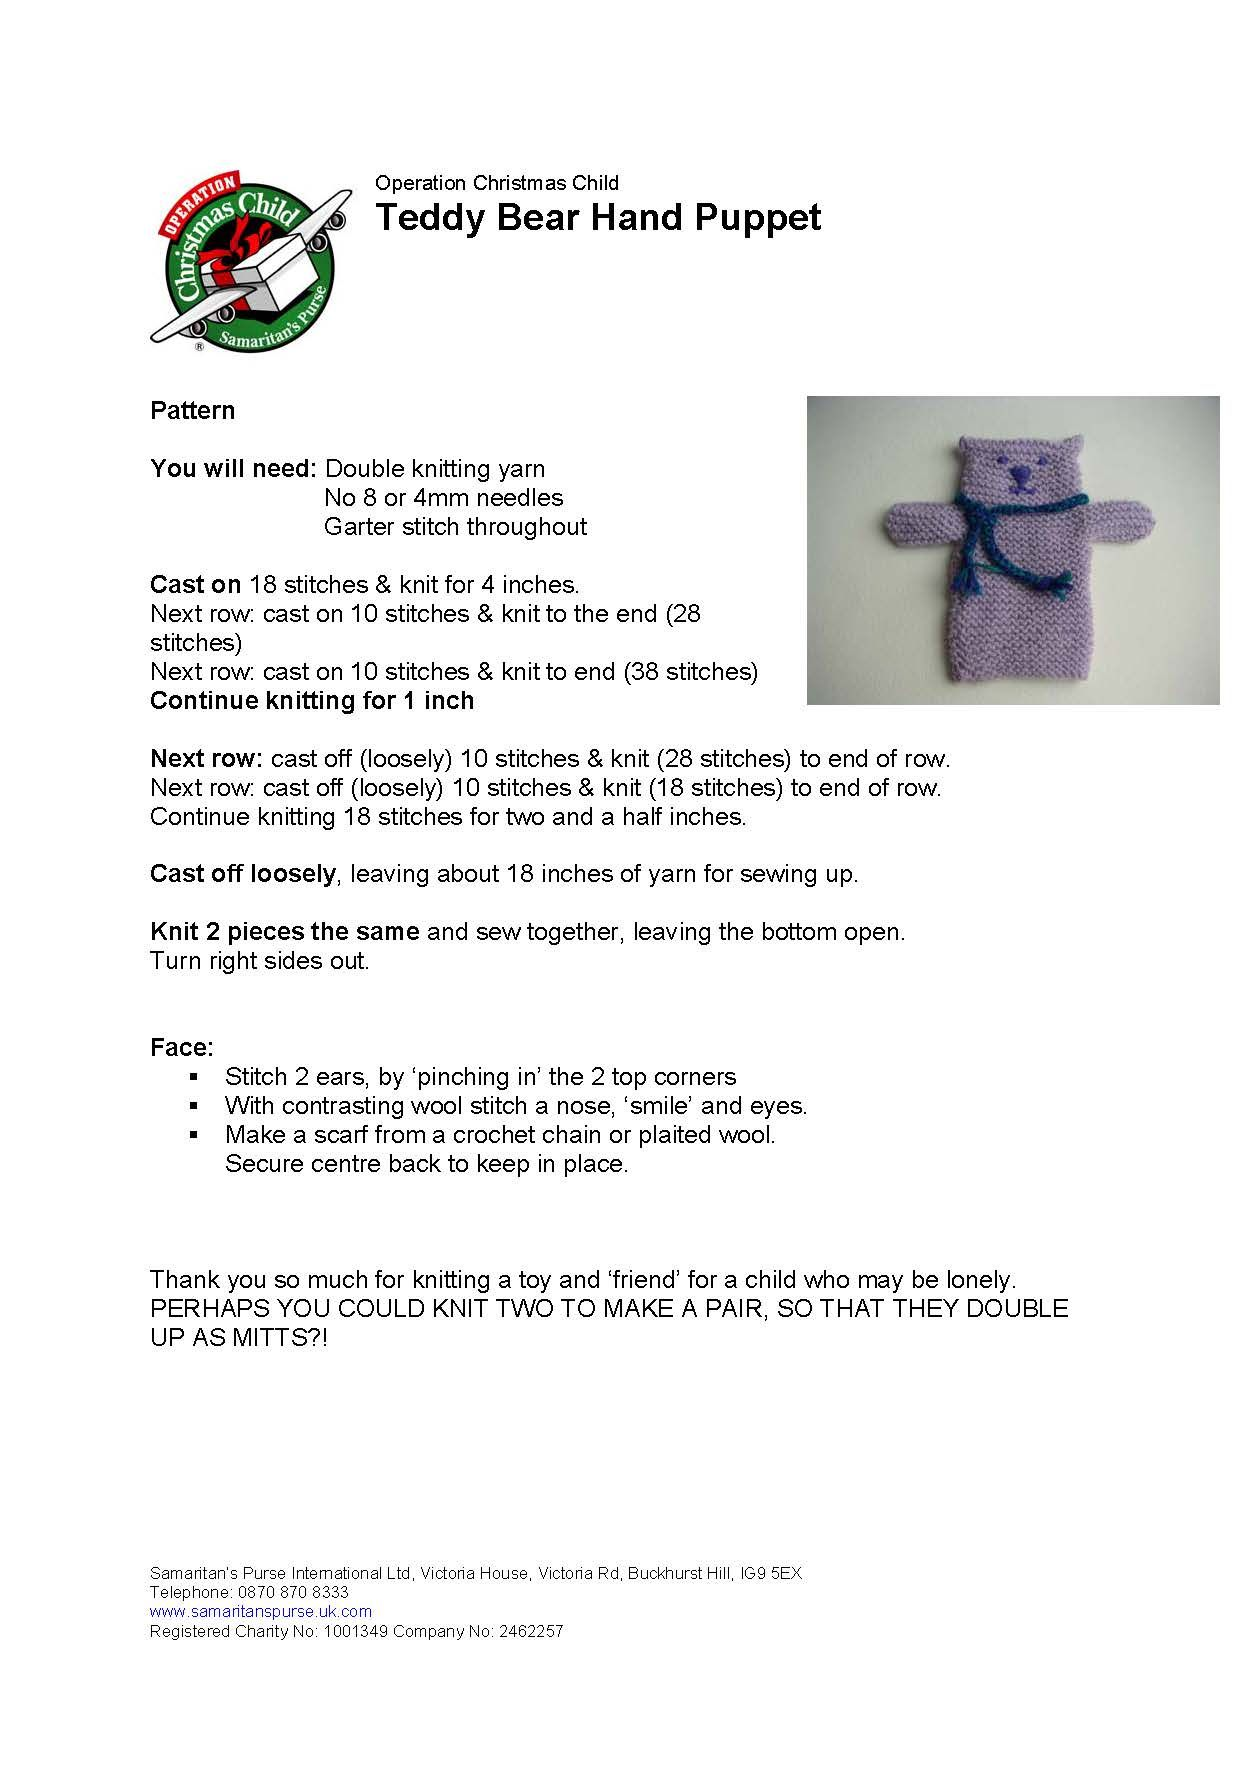 Operation Christmas Cast.Teddy Bear Hand Puppet Knitting Pattern Samaratin S Purse